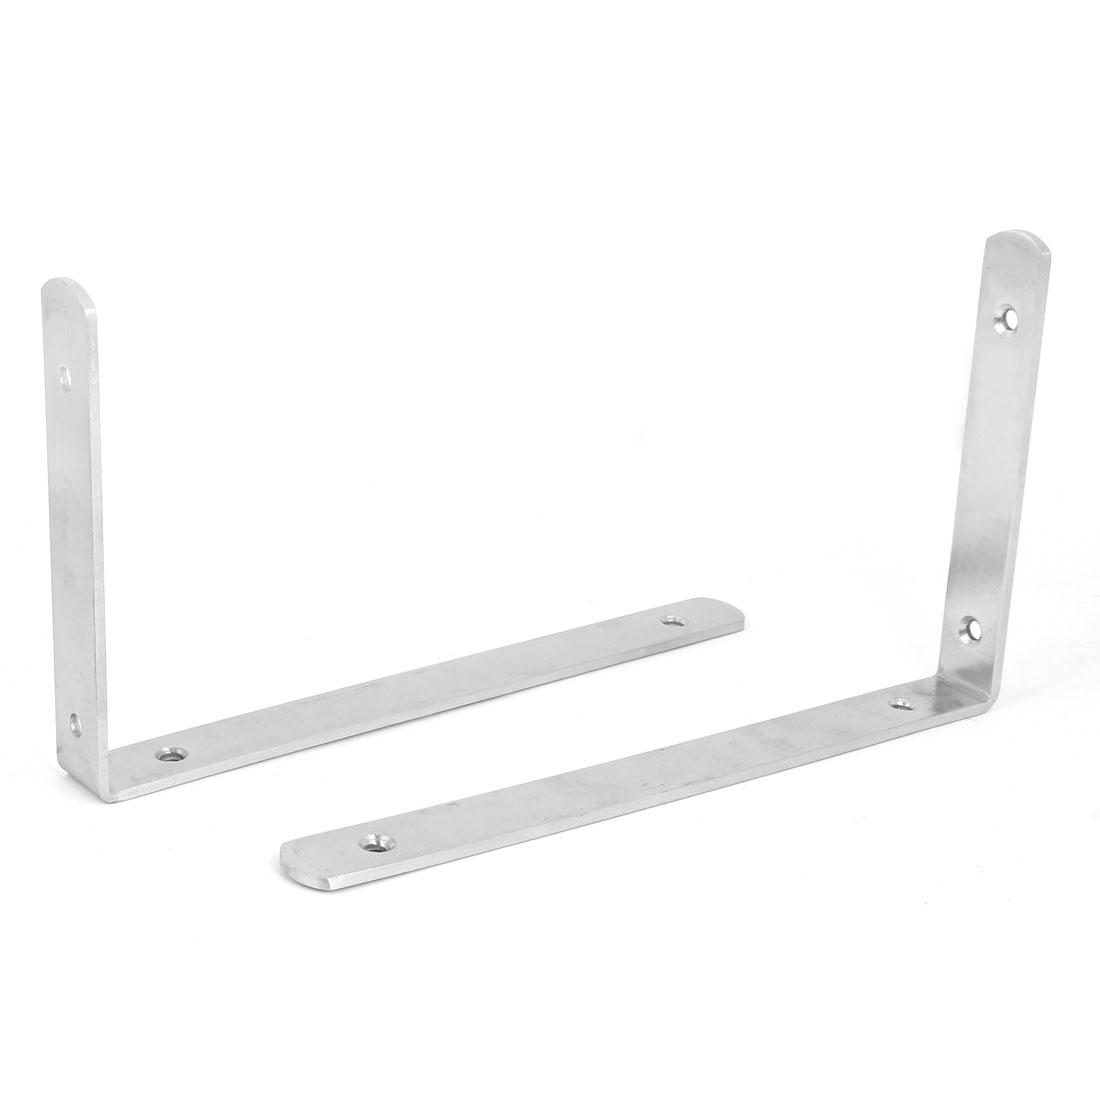 250mm x 150mm Stainless Steel L Shaped Wall Mounted Angle Bracket Brace 2pcs